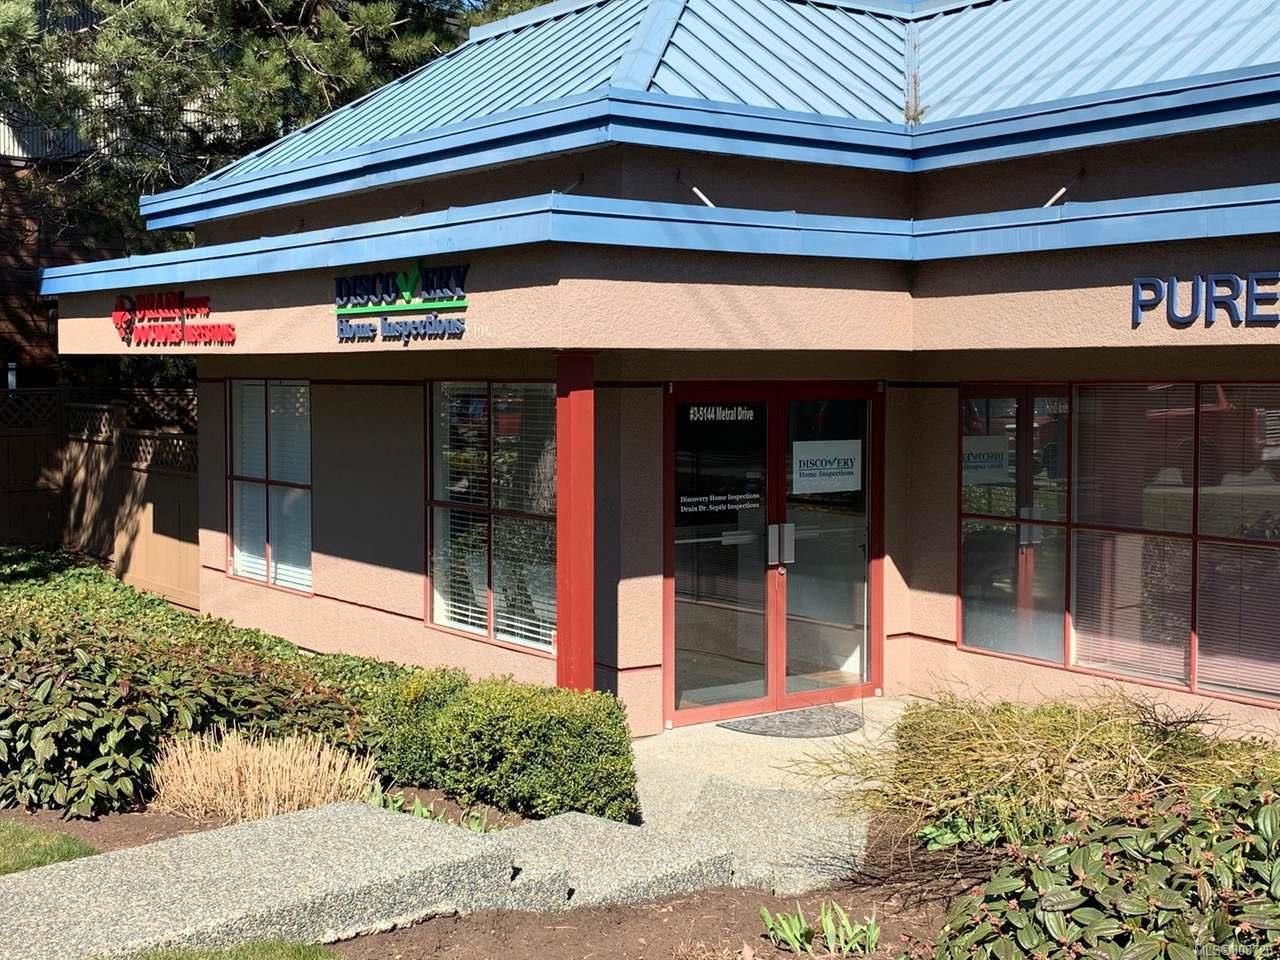 Main Photo: 3 5144 Metral Dr in NANAIMO: Na Pleasant Valley Mixed Use for lease (Nanaimo)  : MLS®# 808726